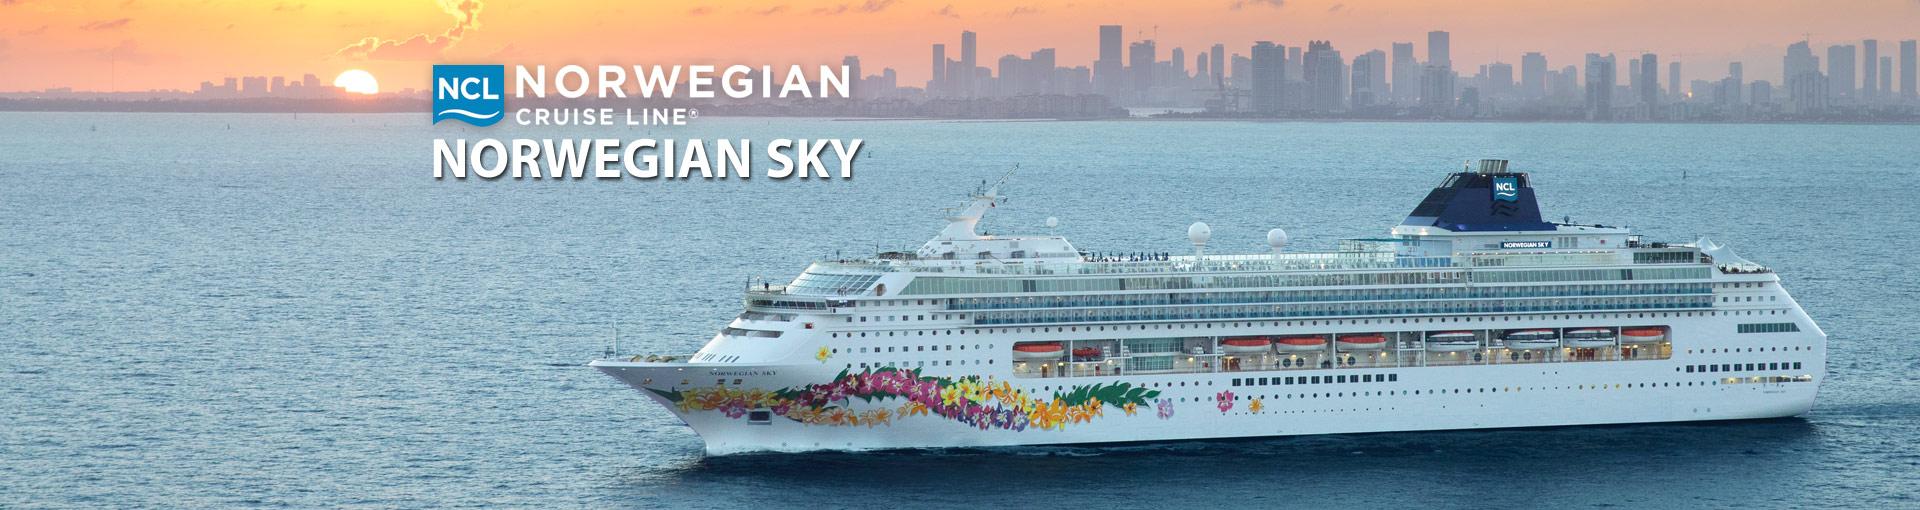 Norwegian Sky Cruise Ship Banner